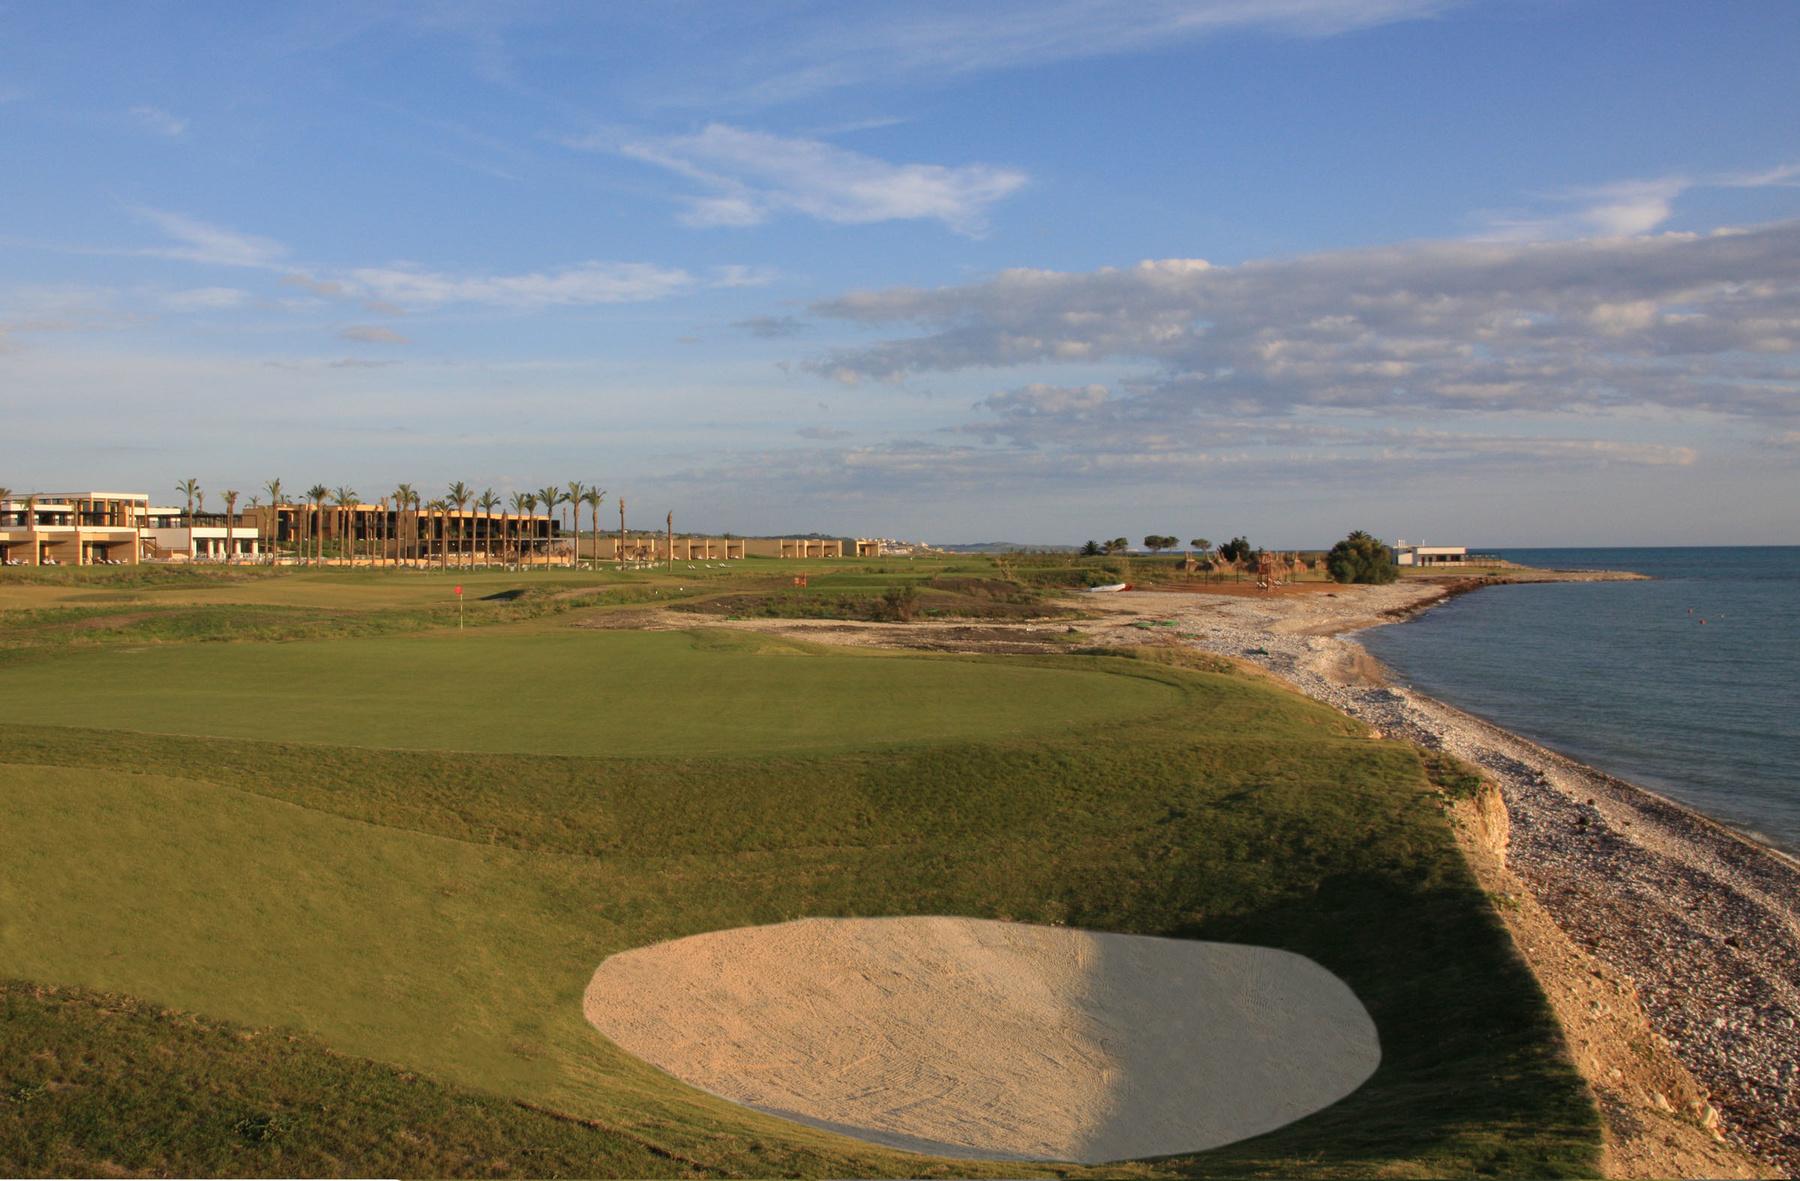 Verdura Golf and Spa Resort 17th green to tee & hotel